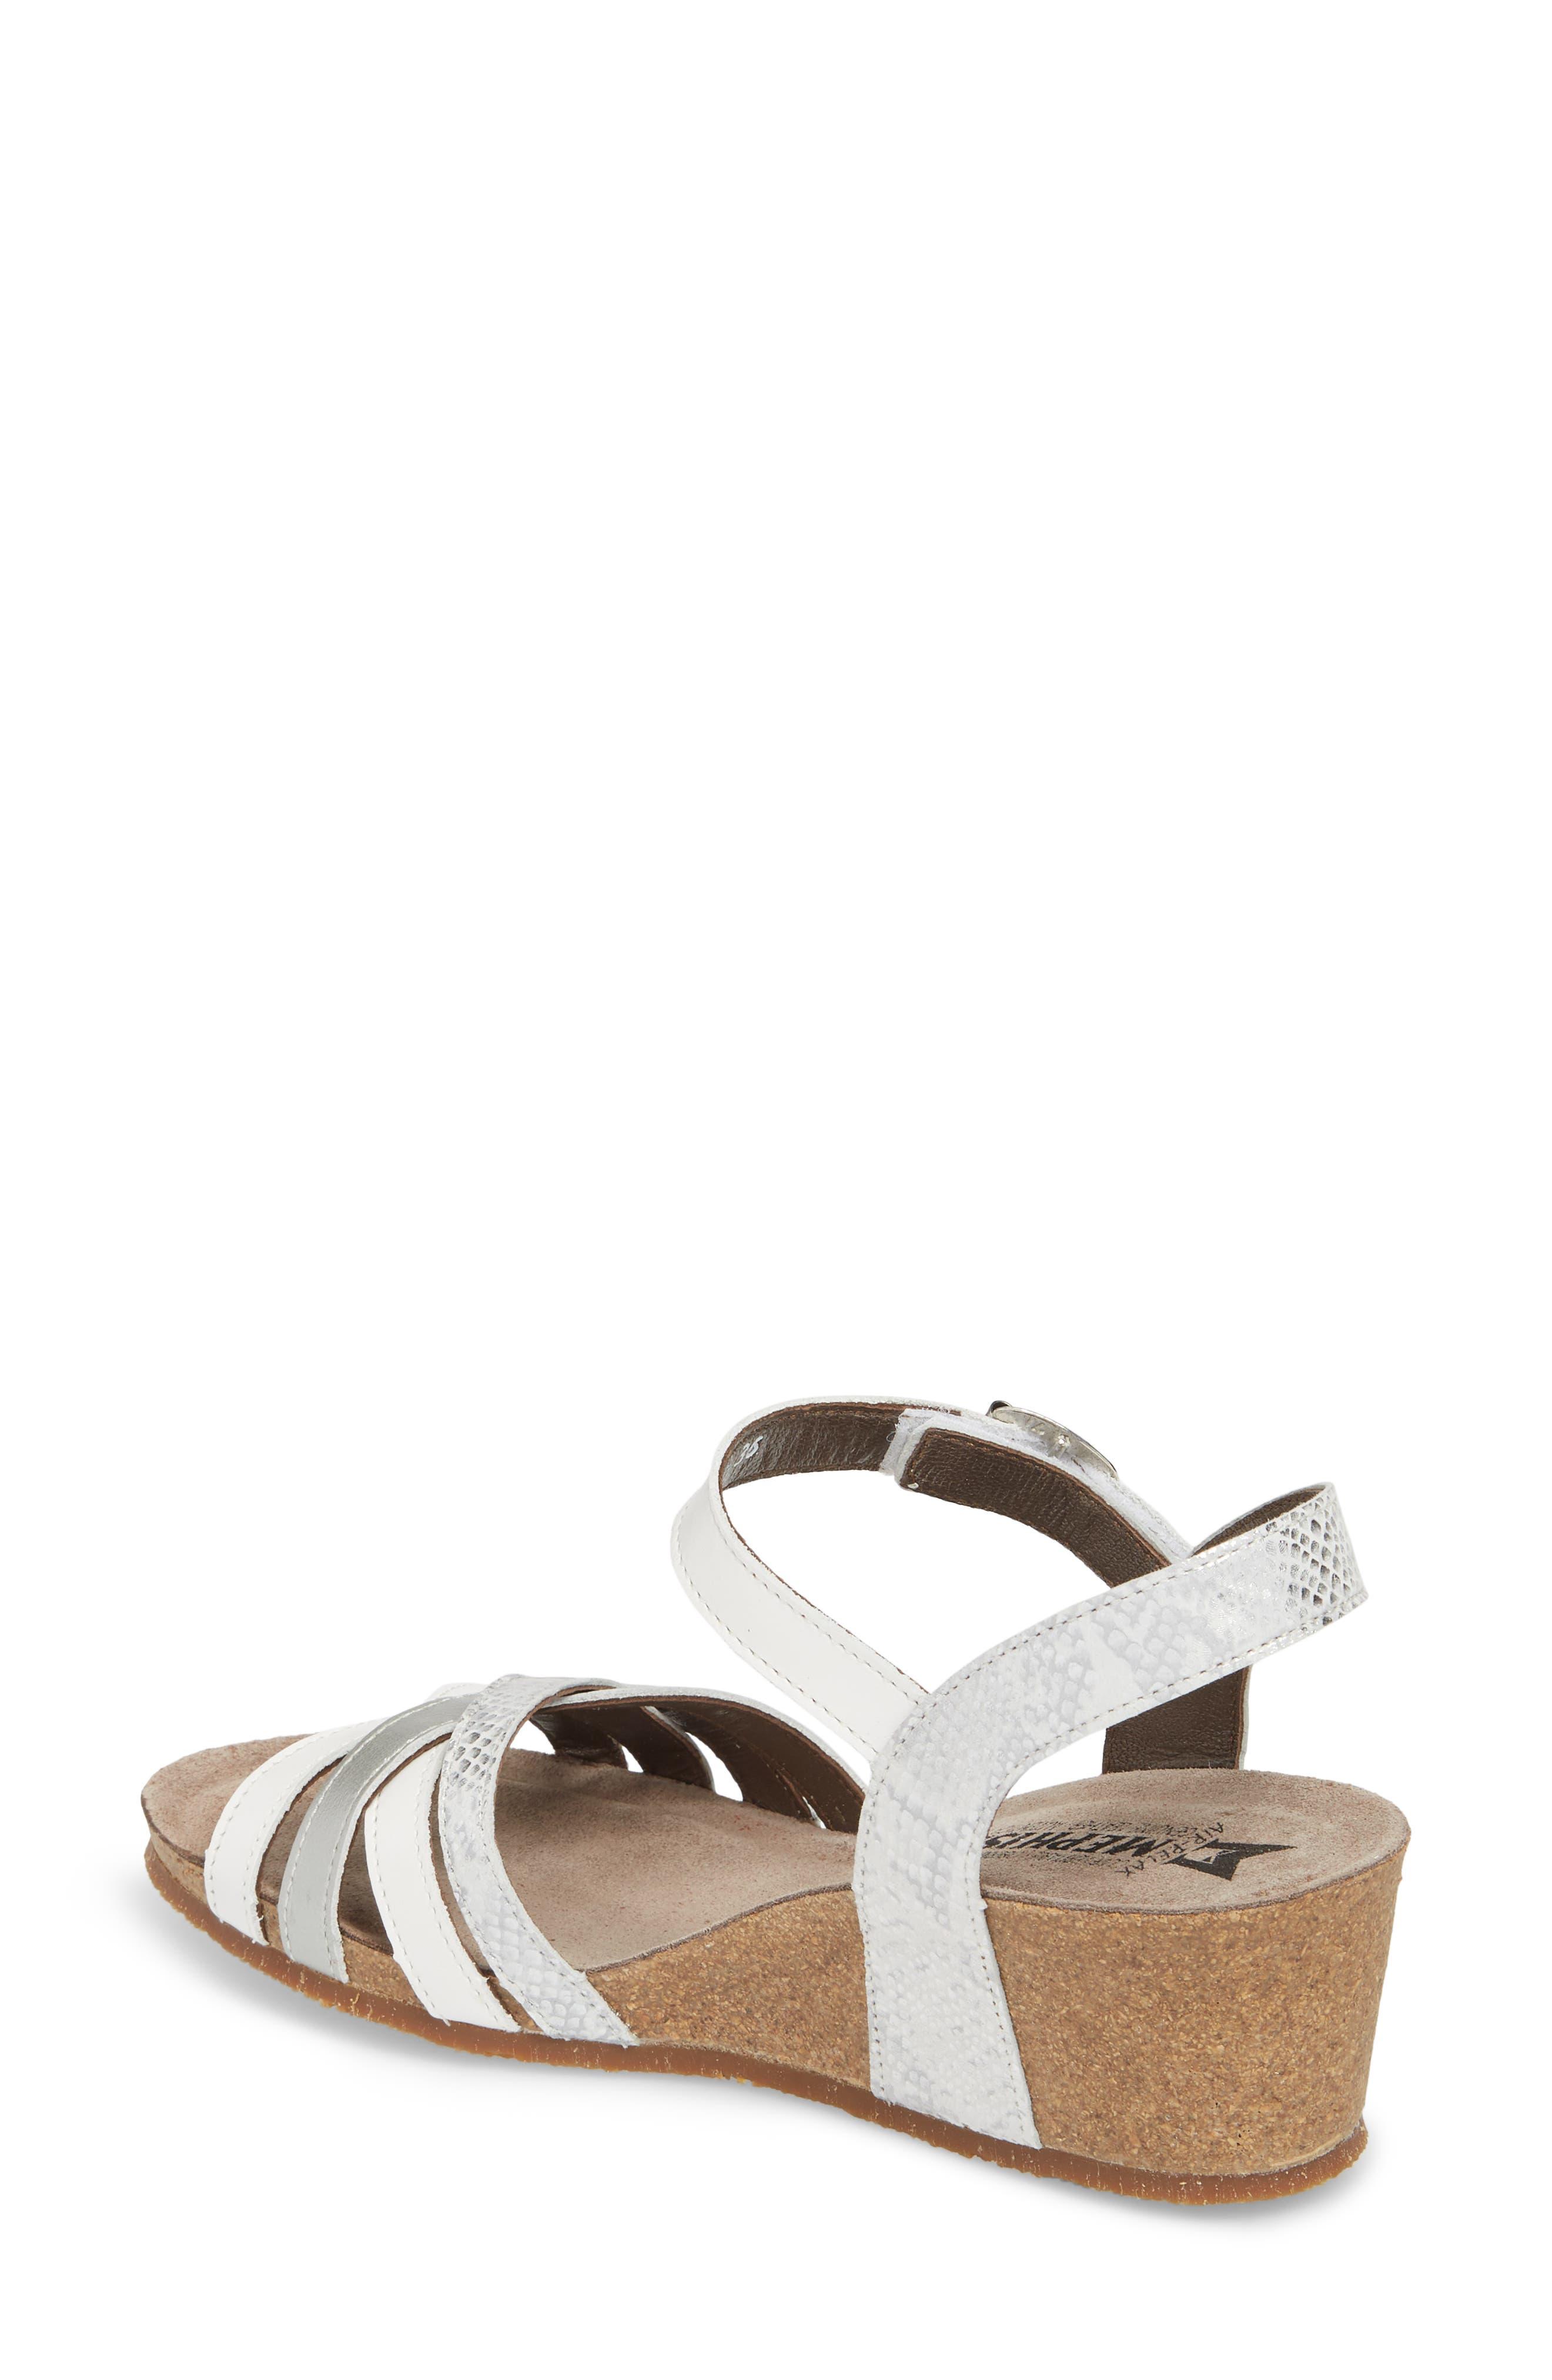 Mado Wedge Sandal,                             Alternate thumbnail 2, color,                             White Leather